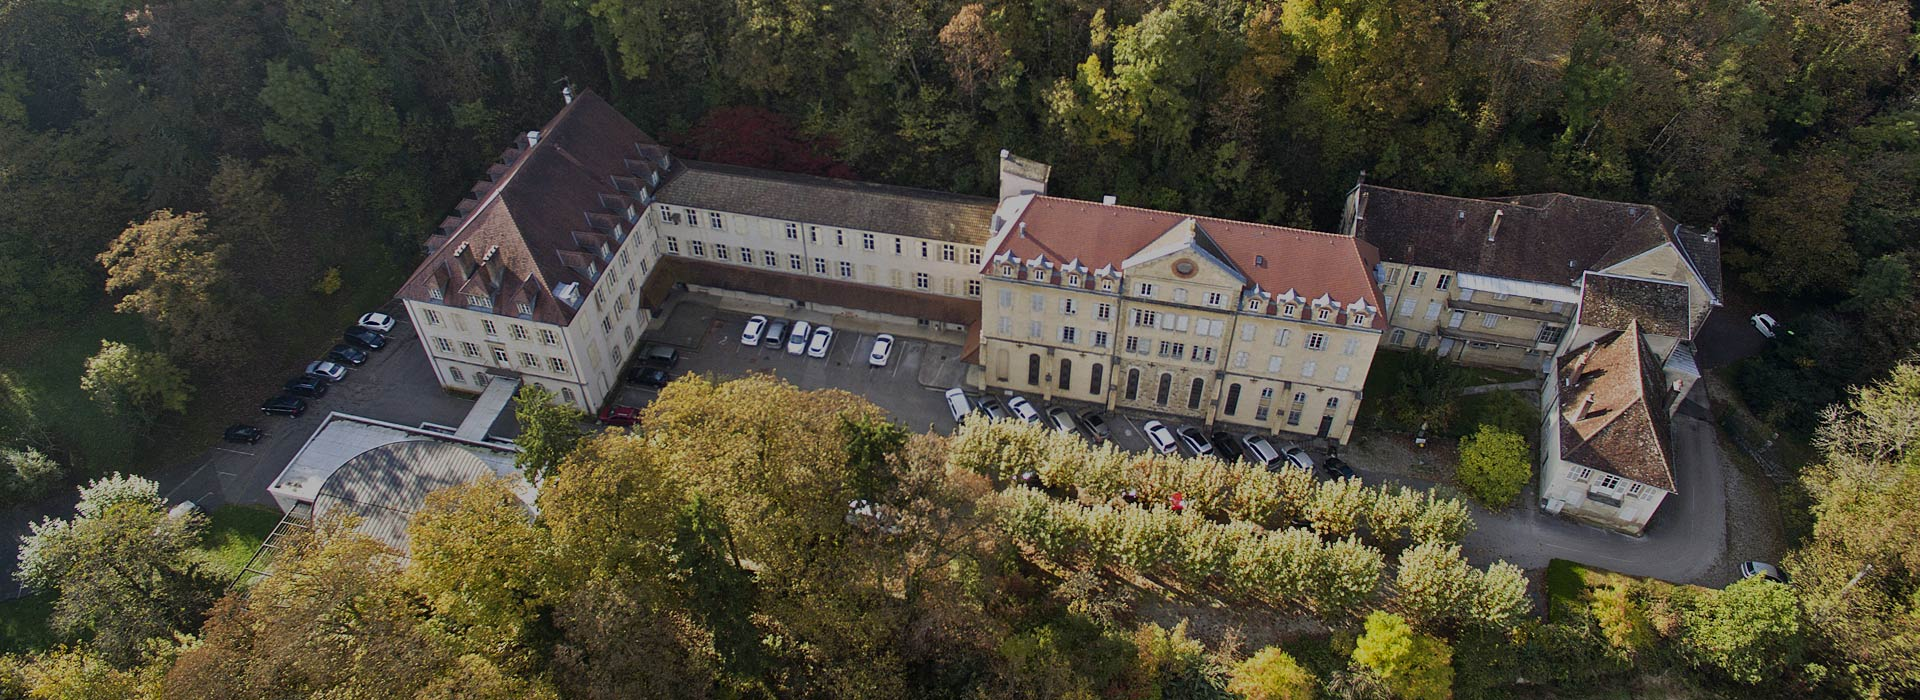 Location Salle Reunion Formation Fete Lons Saunier Jura